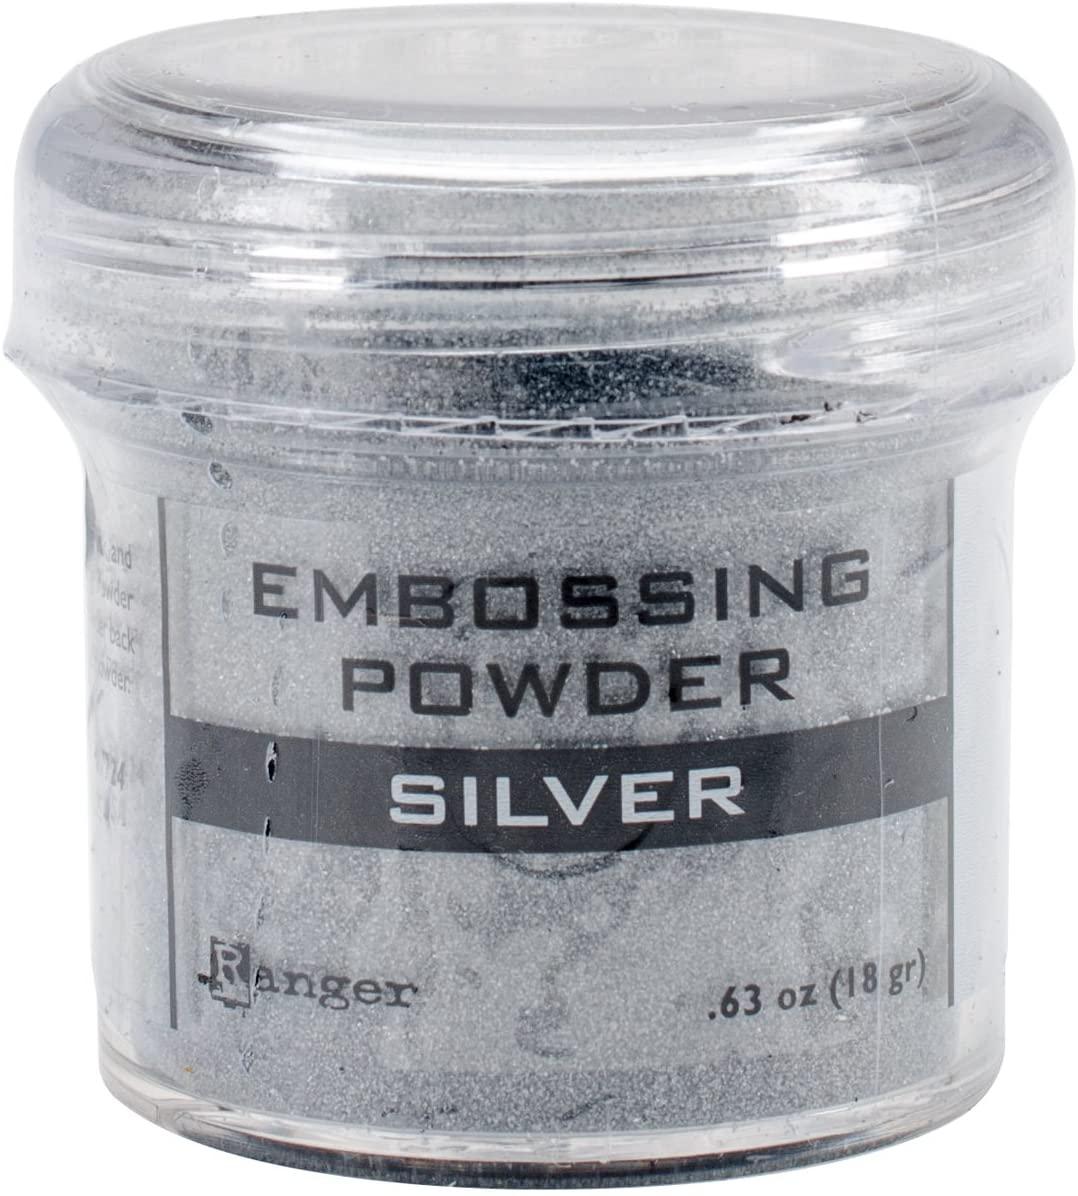 Ranger Embossing Powder, 0.63 oz Jar, Silver